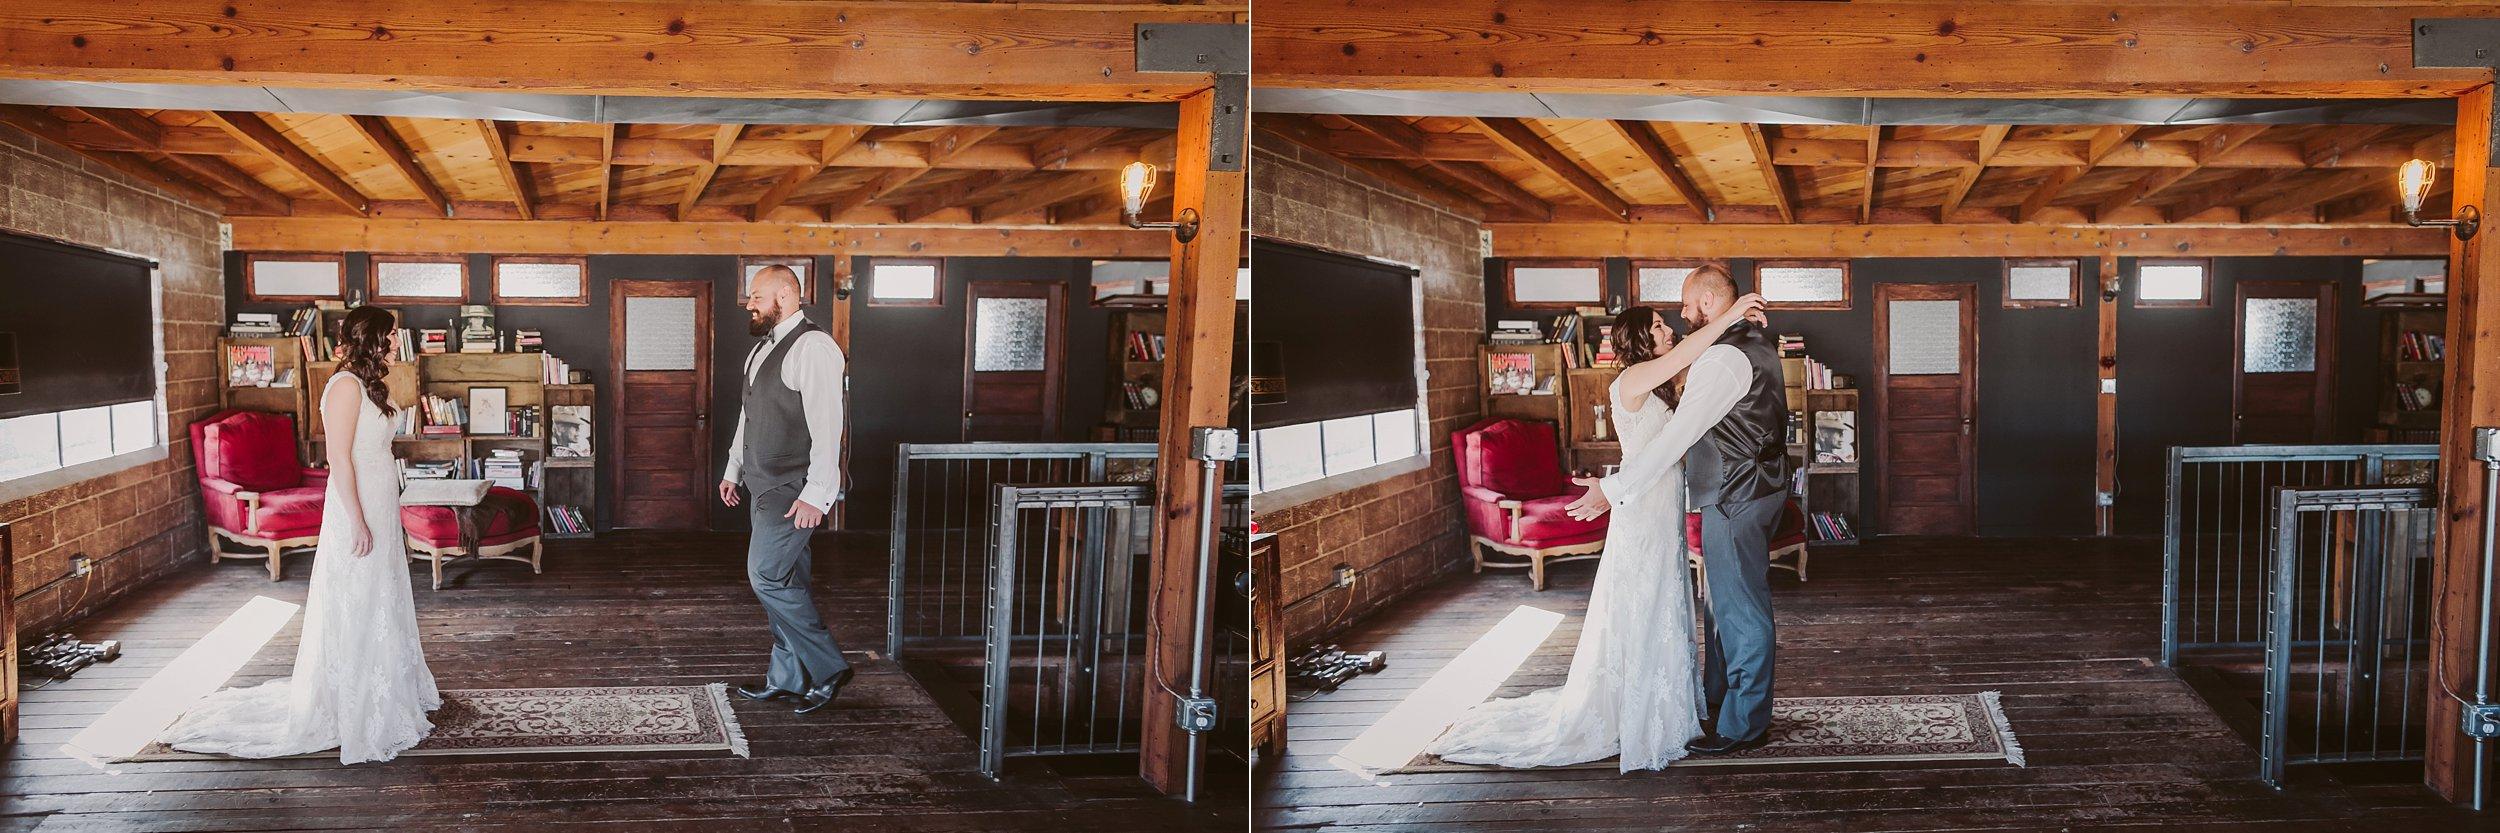 Smoky Hollw Studios Wedding_0009.jpg